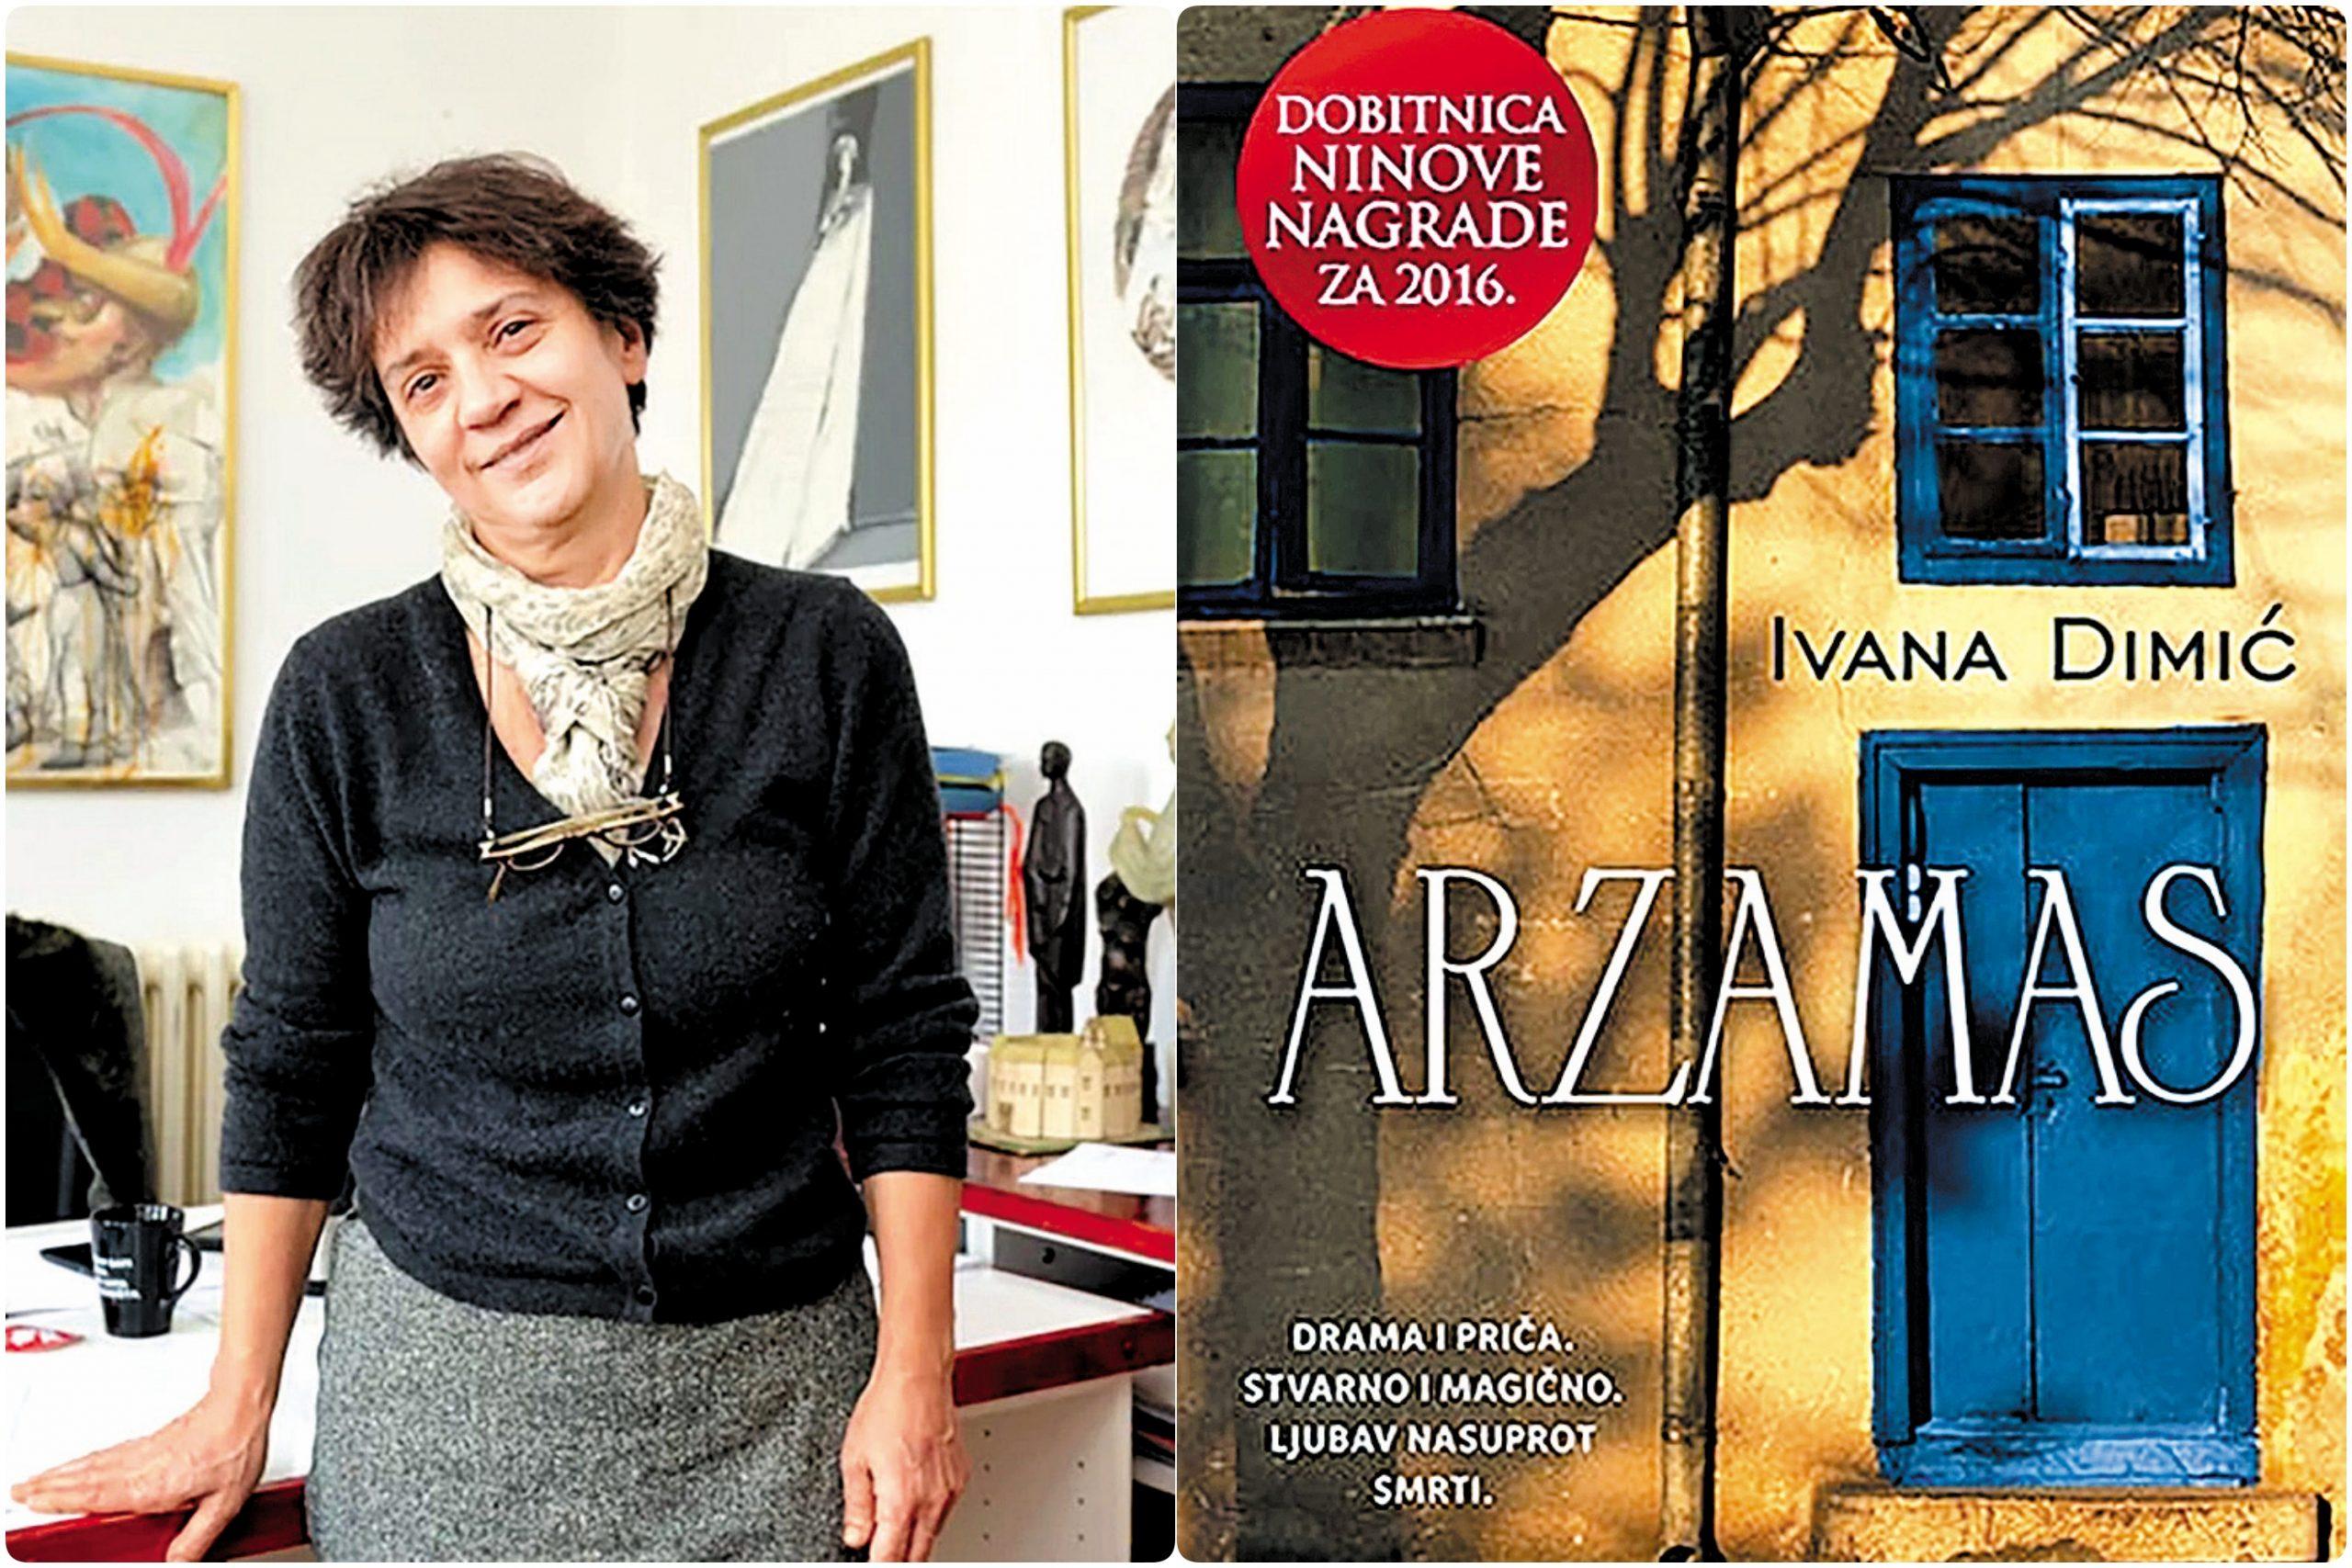 Ivana Dimic Arazmas